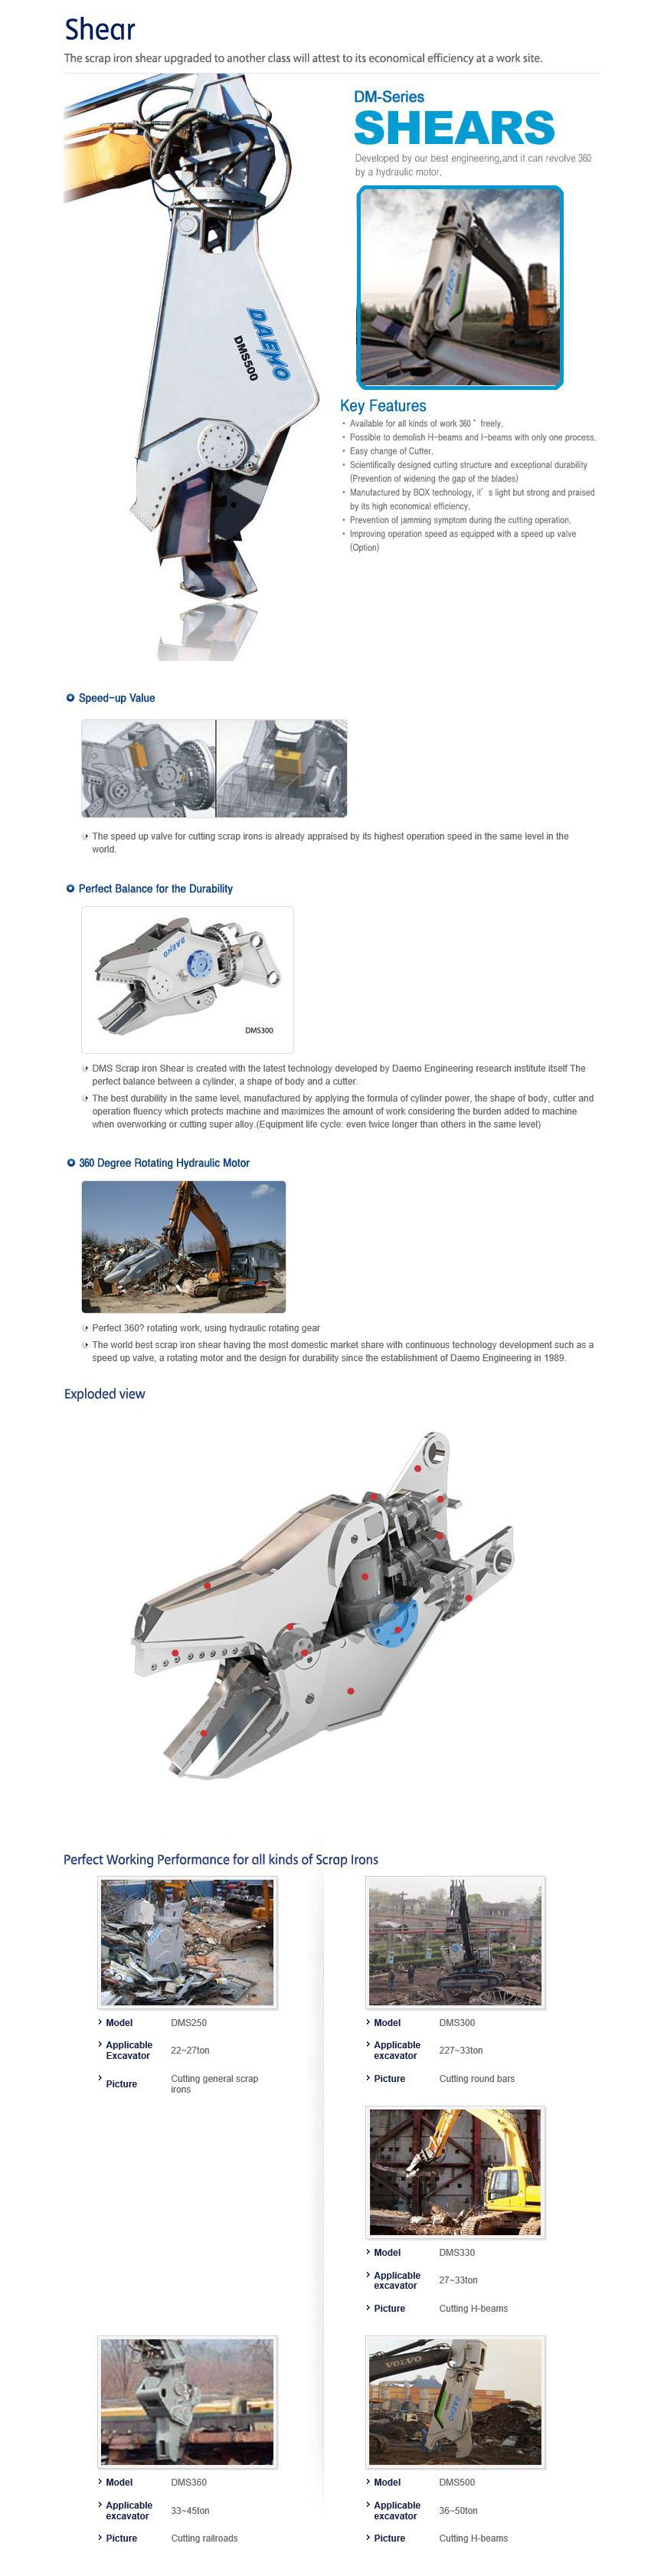 DAEMO ENGINEERING Shear DM-Series